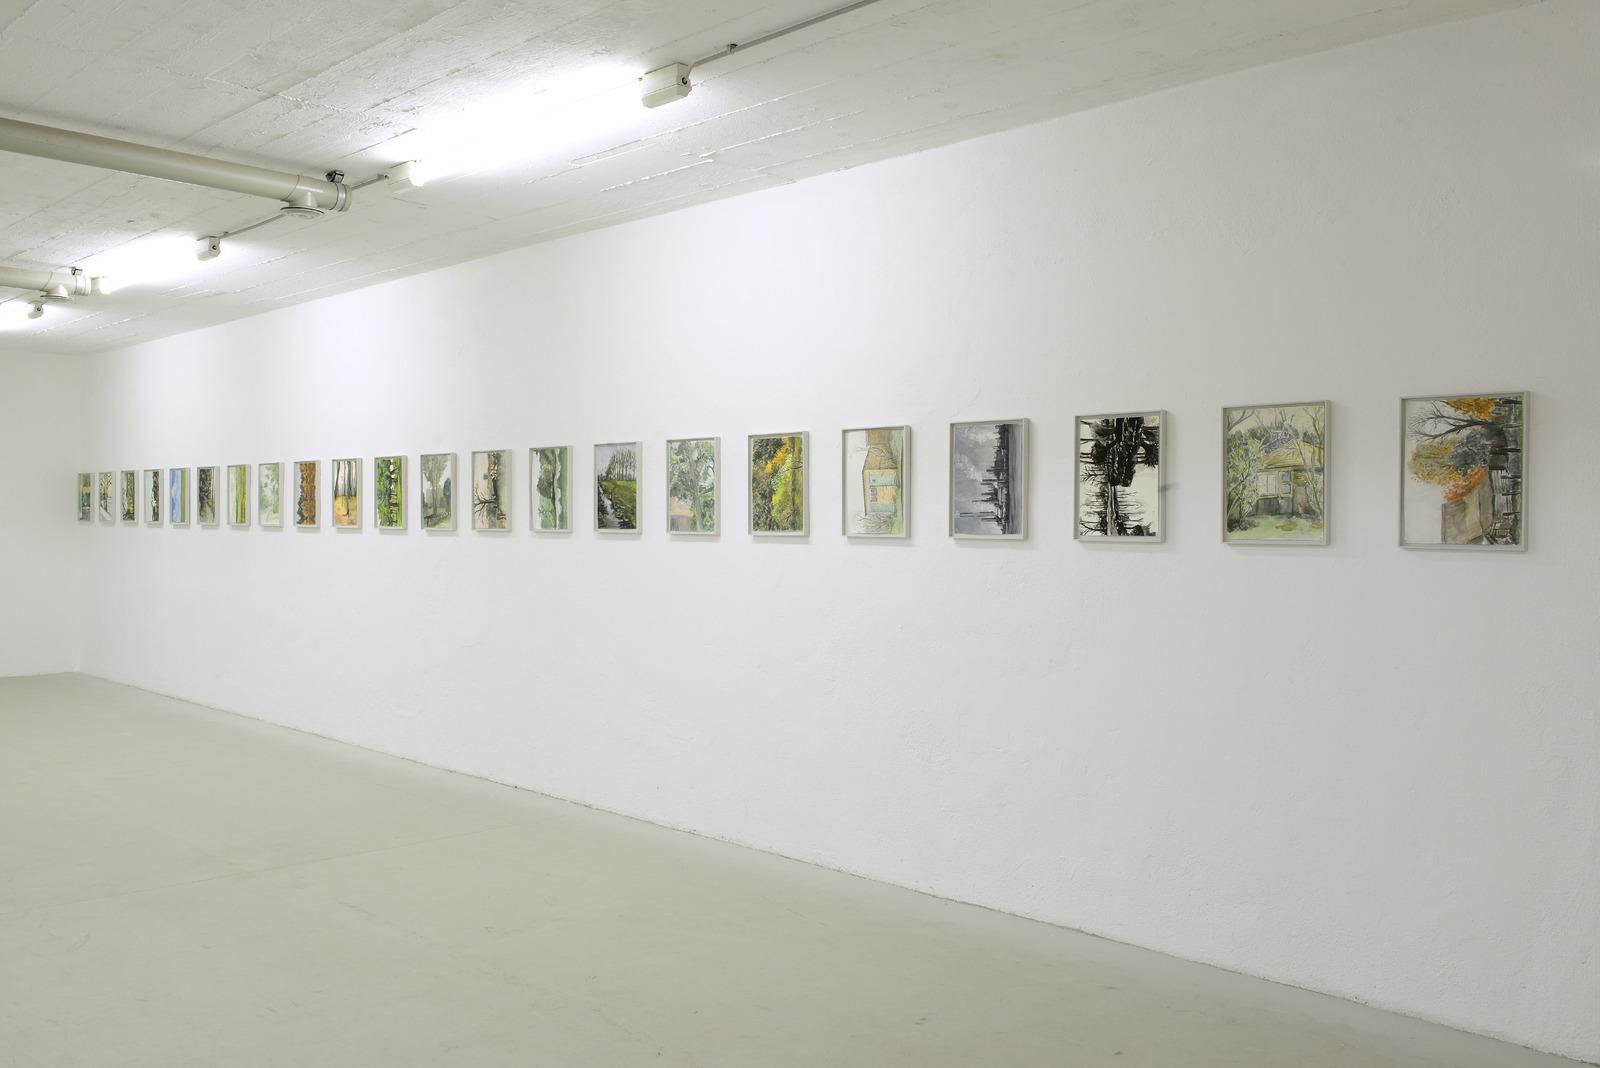 Leen Voet, Kunstbunker 18